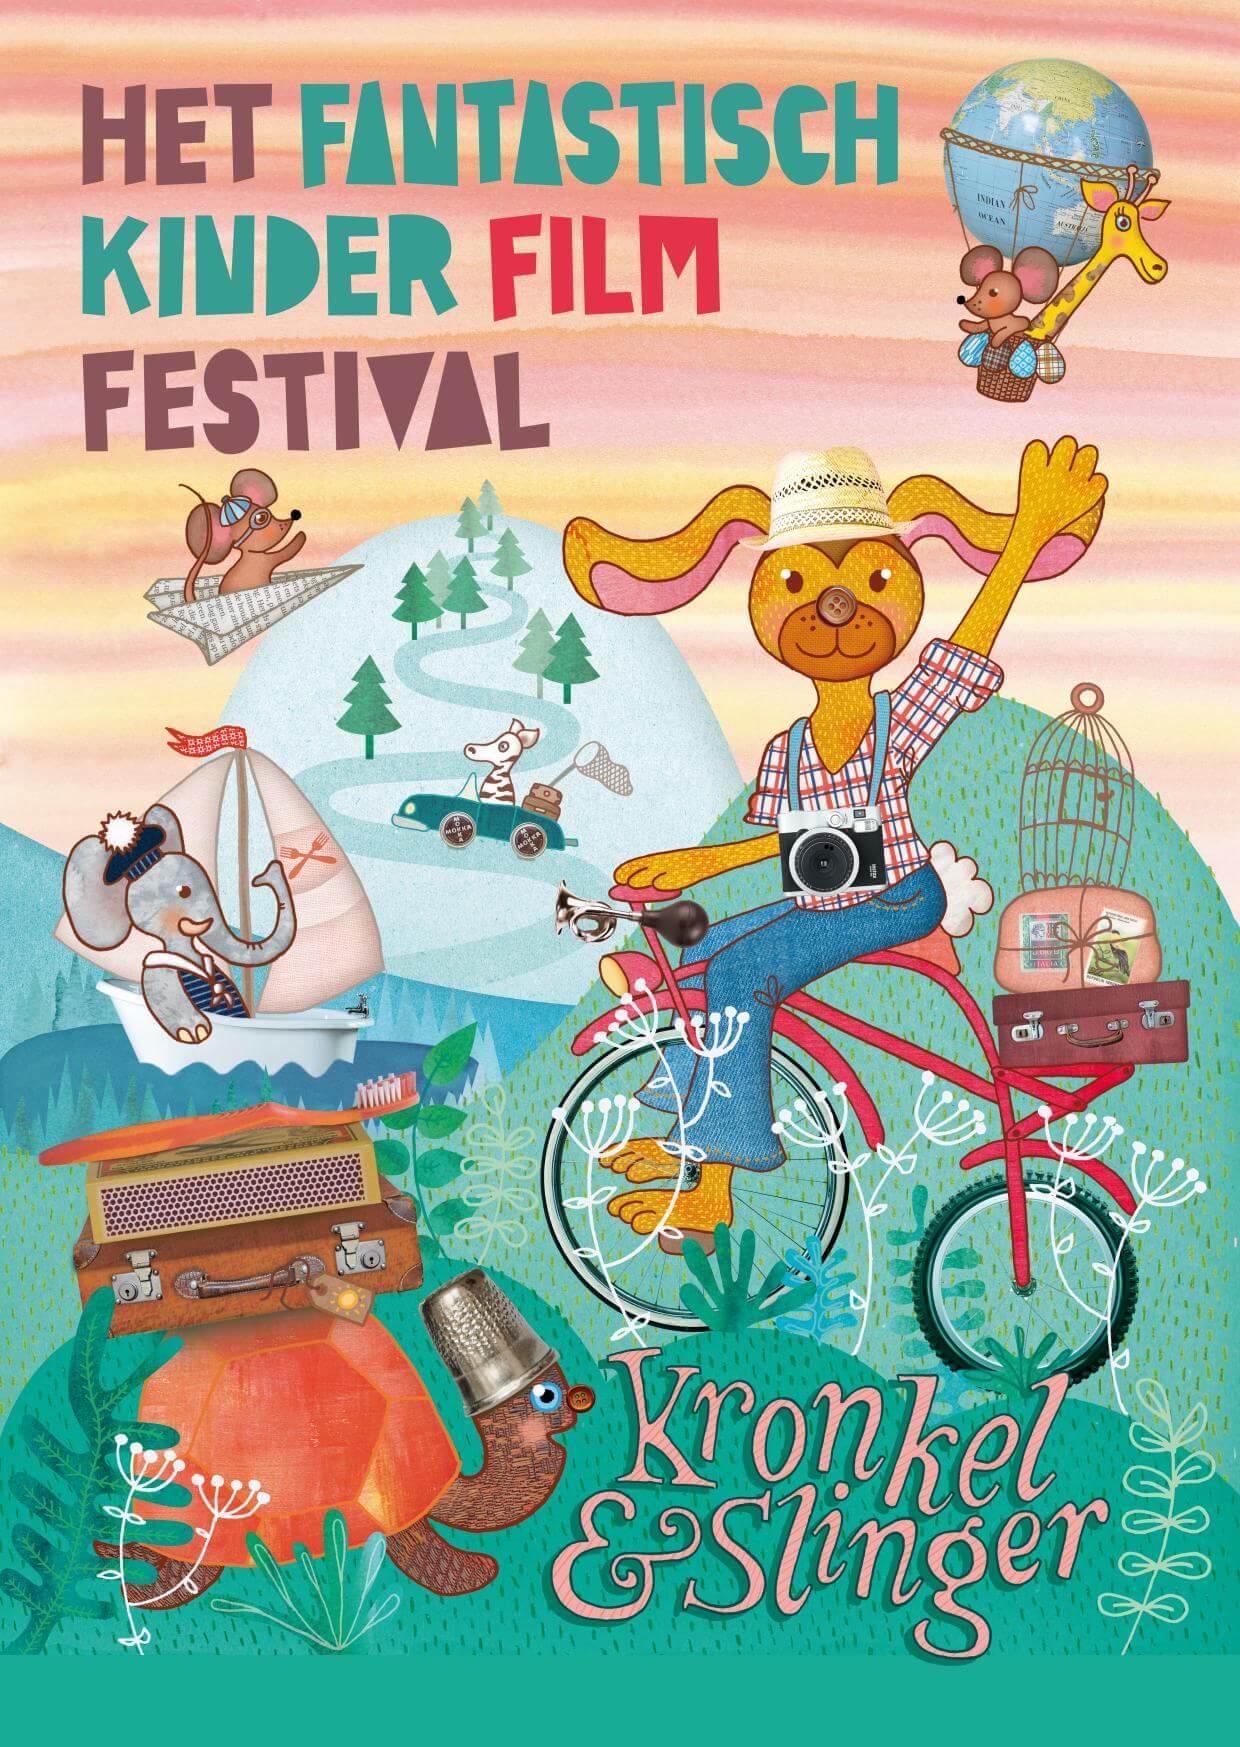 Fantastisch Kinderfilm Festival poster